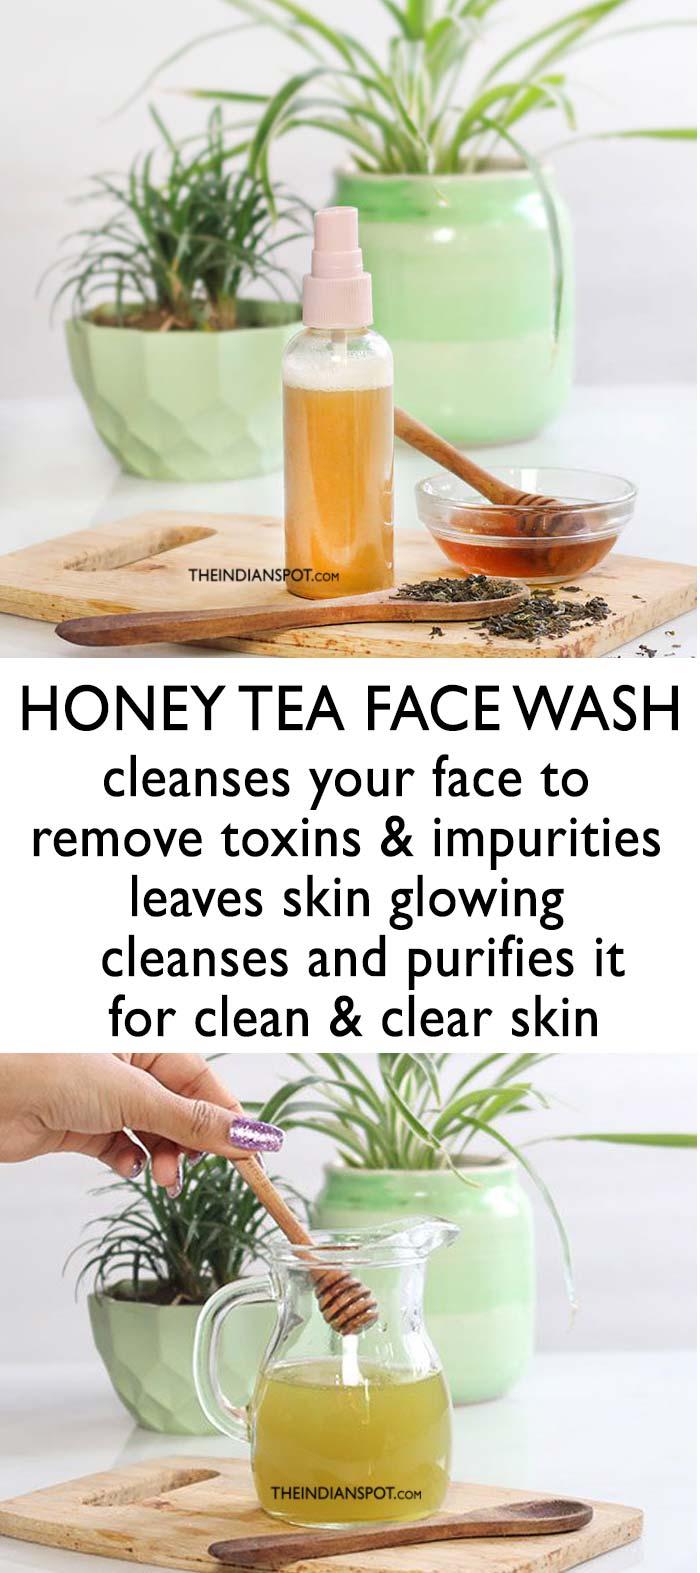 NOURISHING HONEY TEA FACE WASH